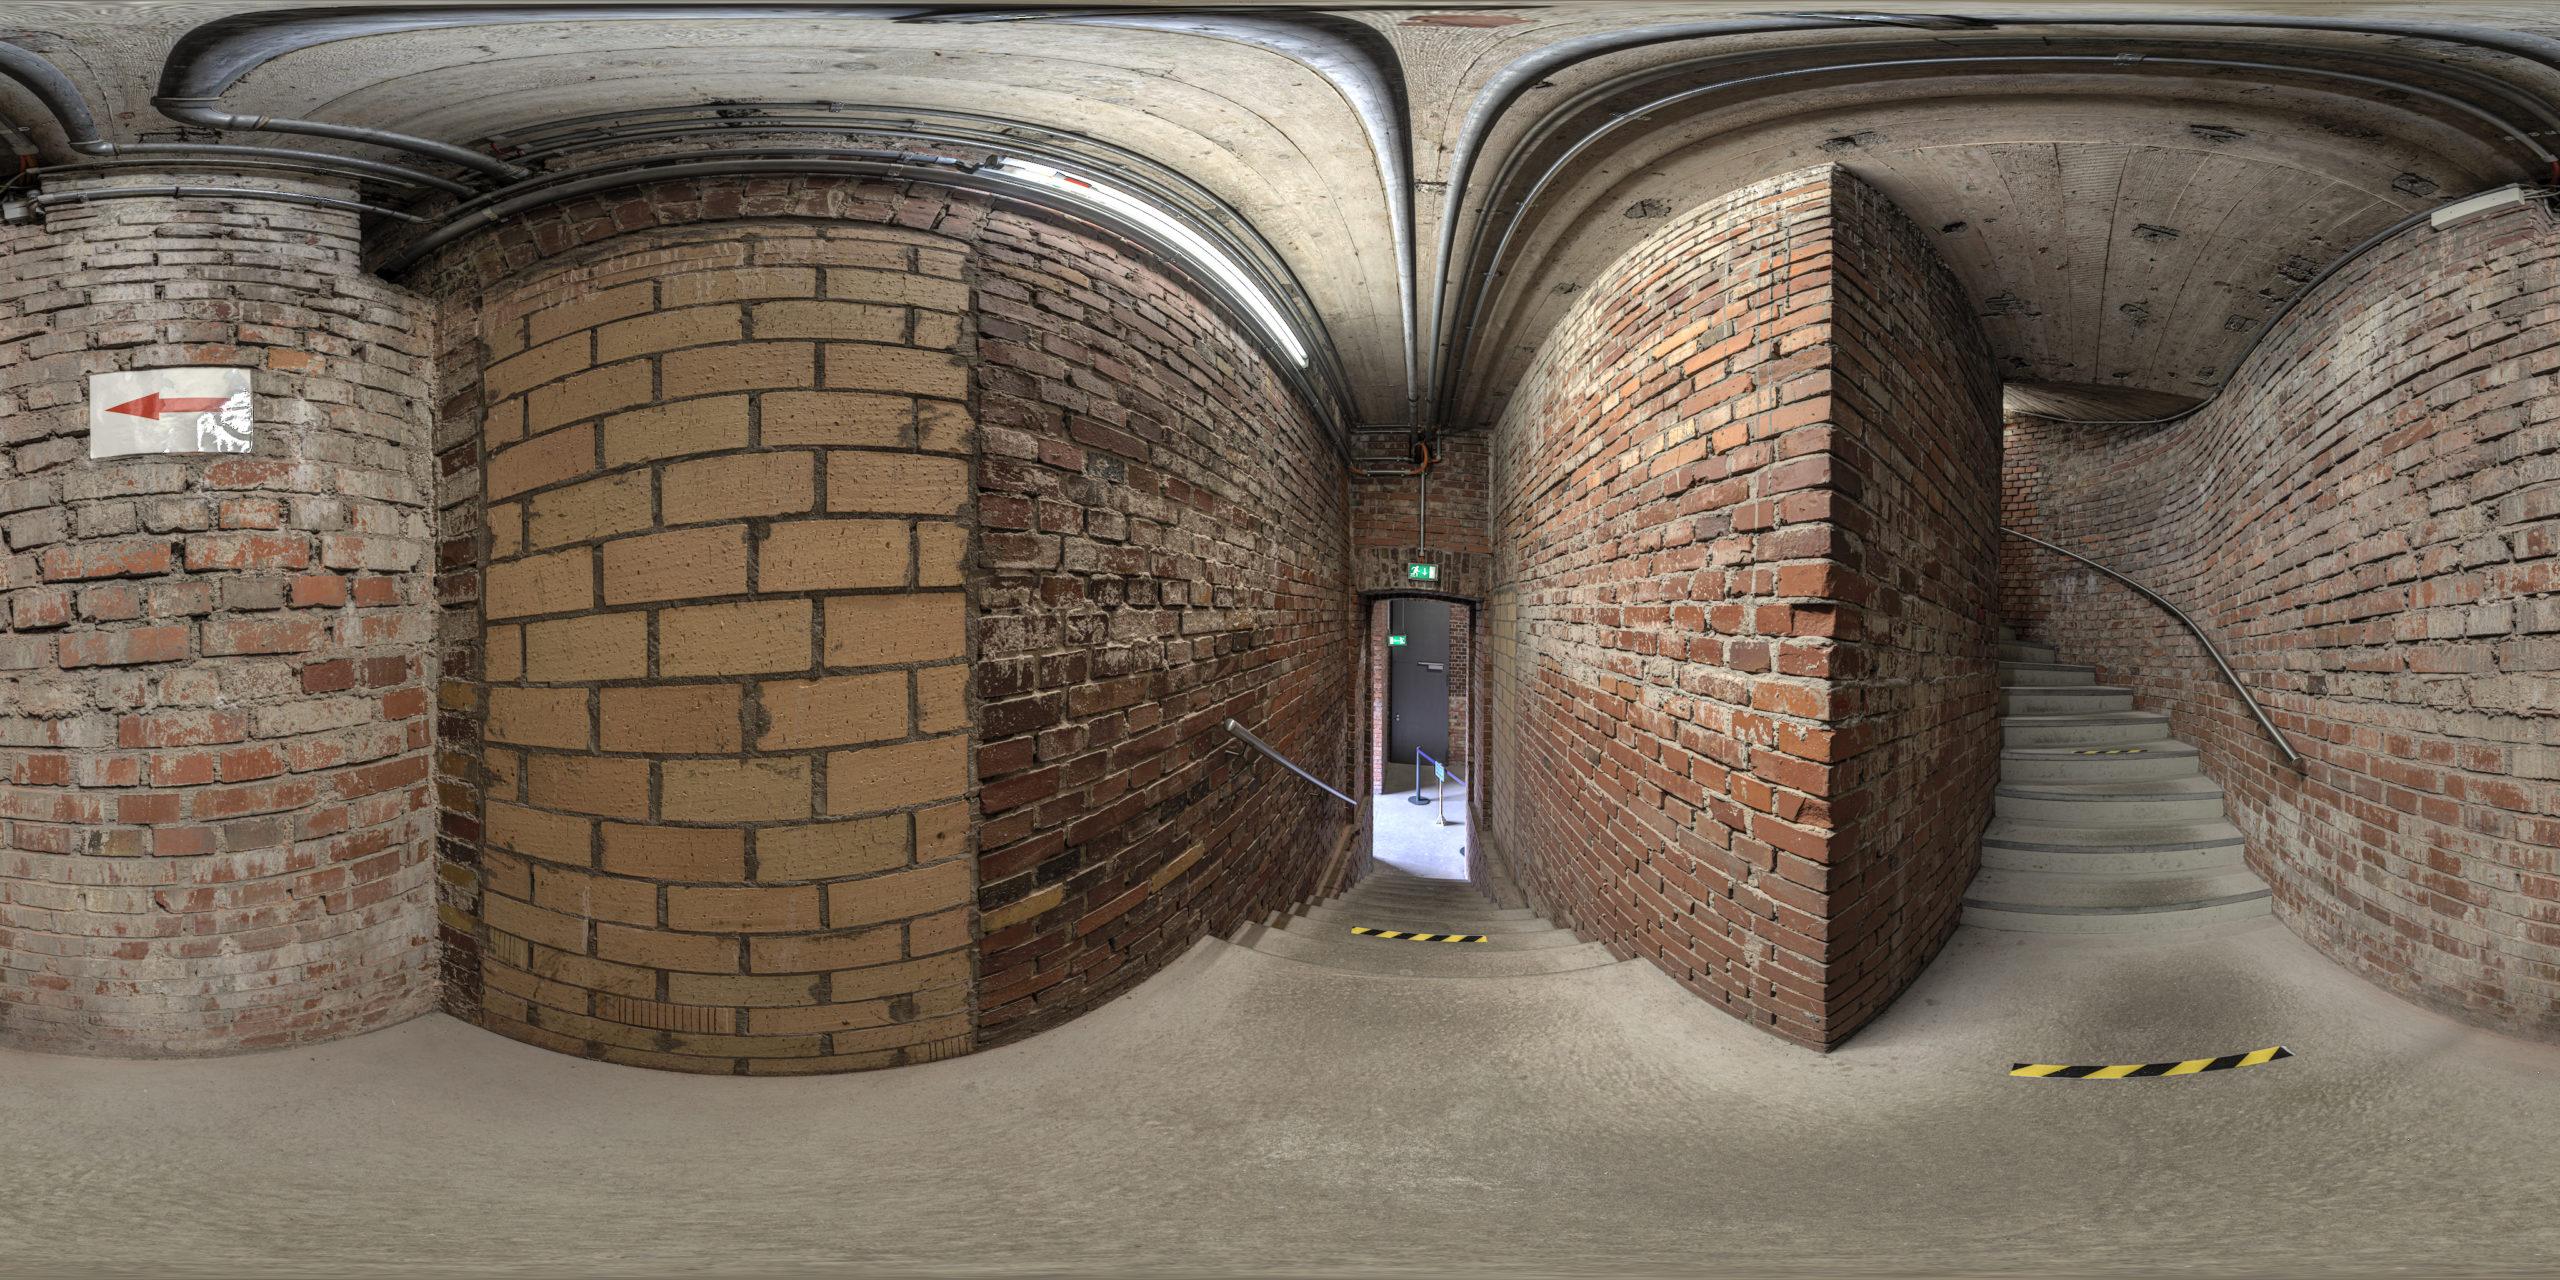 HDRI-Skies-Entrance-Reichsparteitagsmuseum-Nürnberg